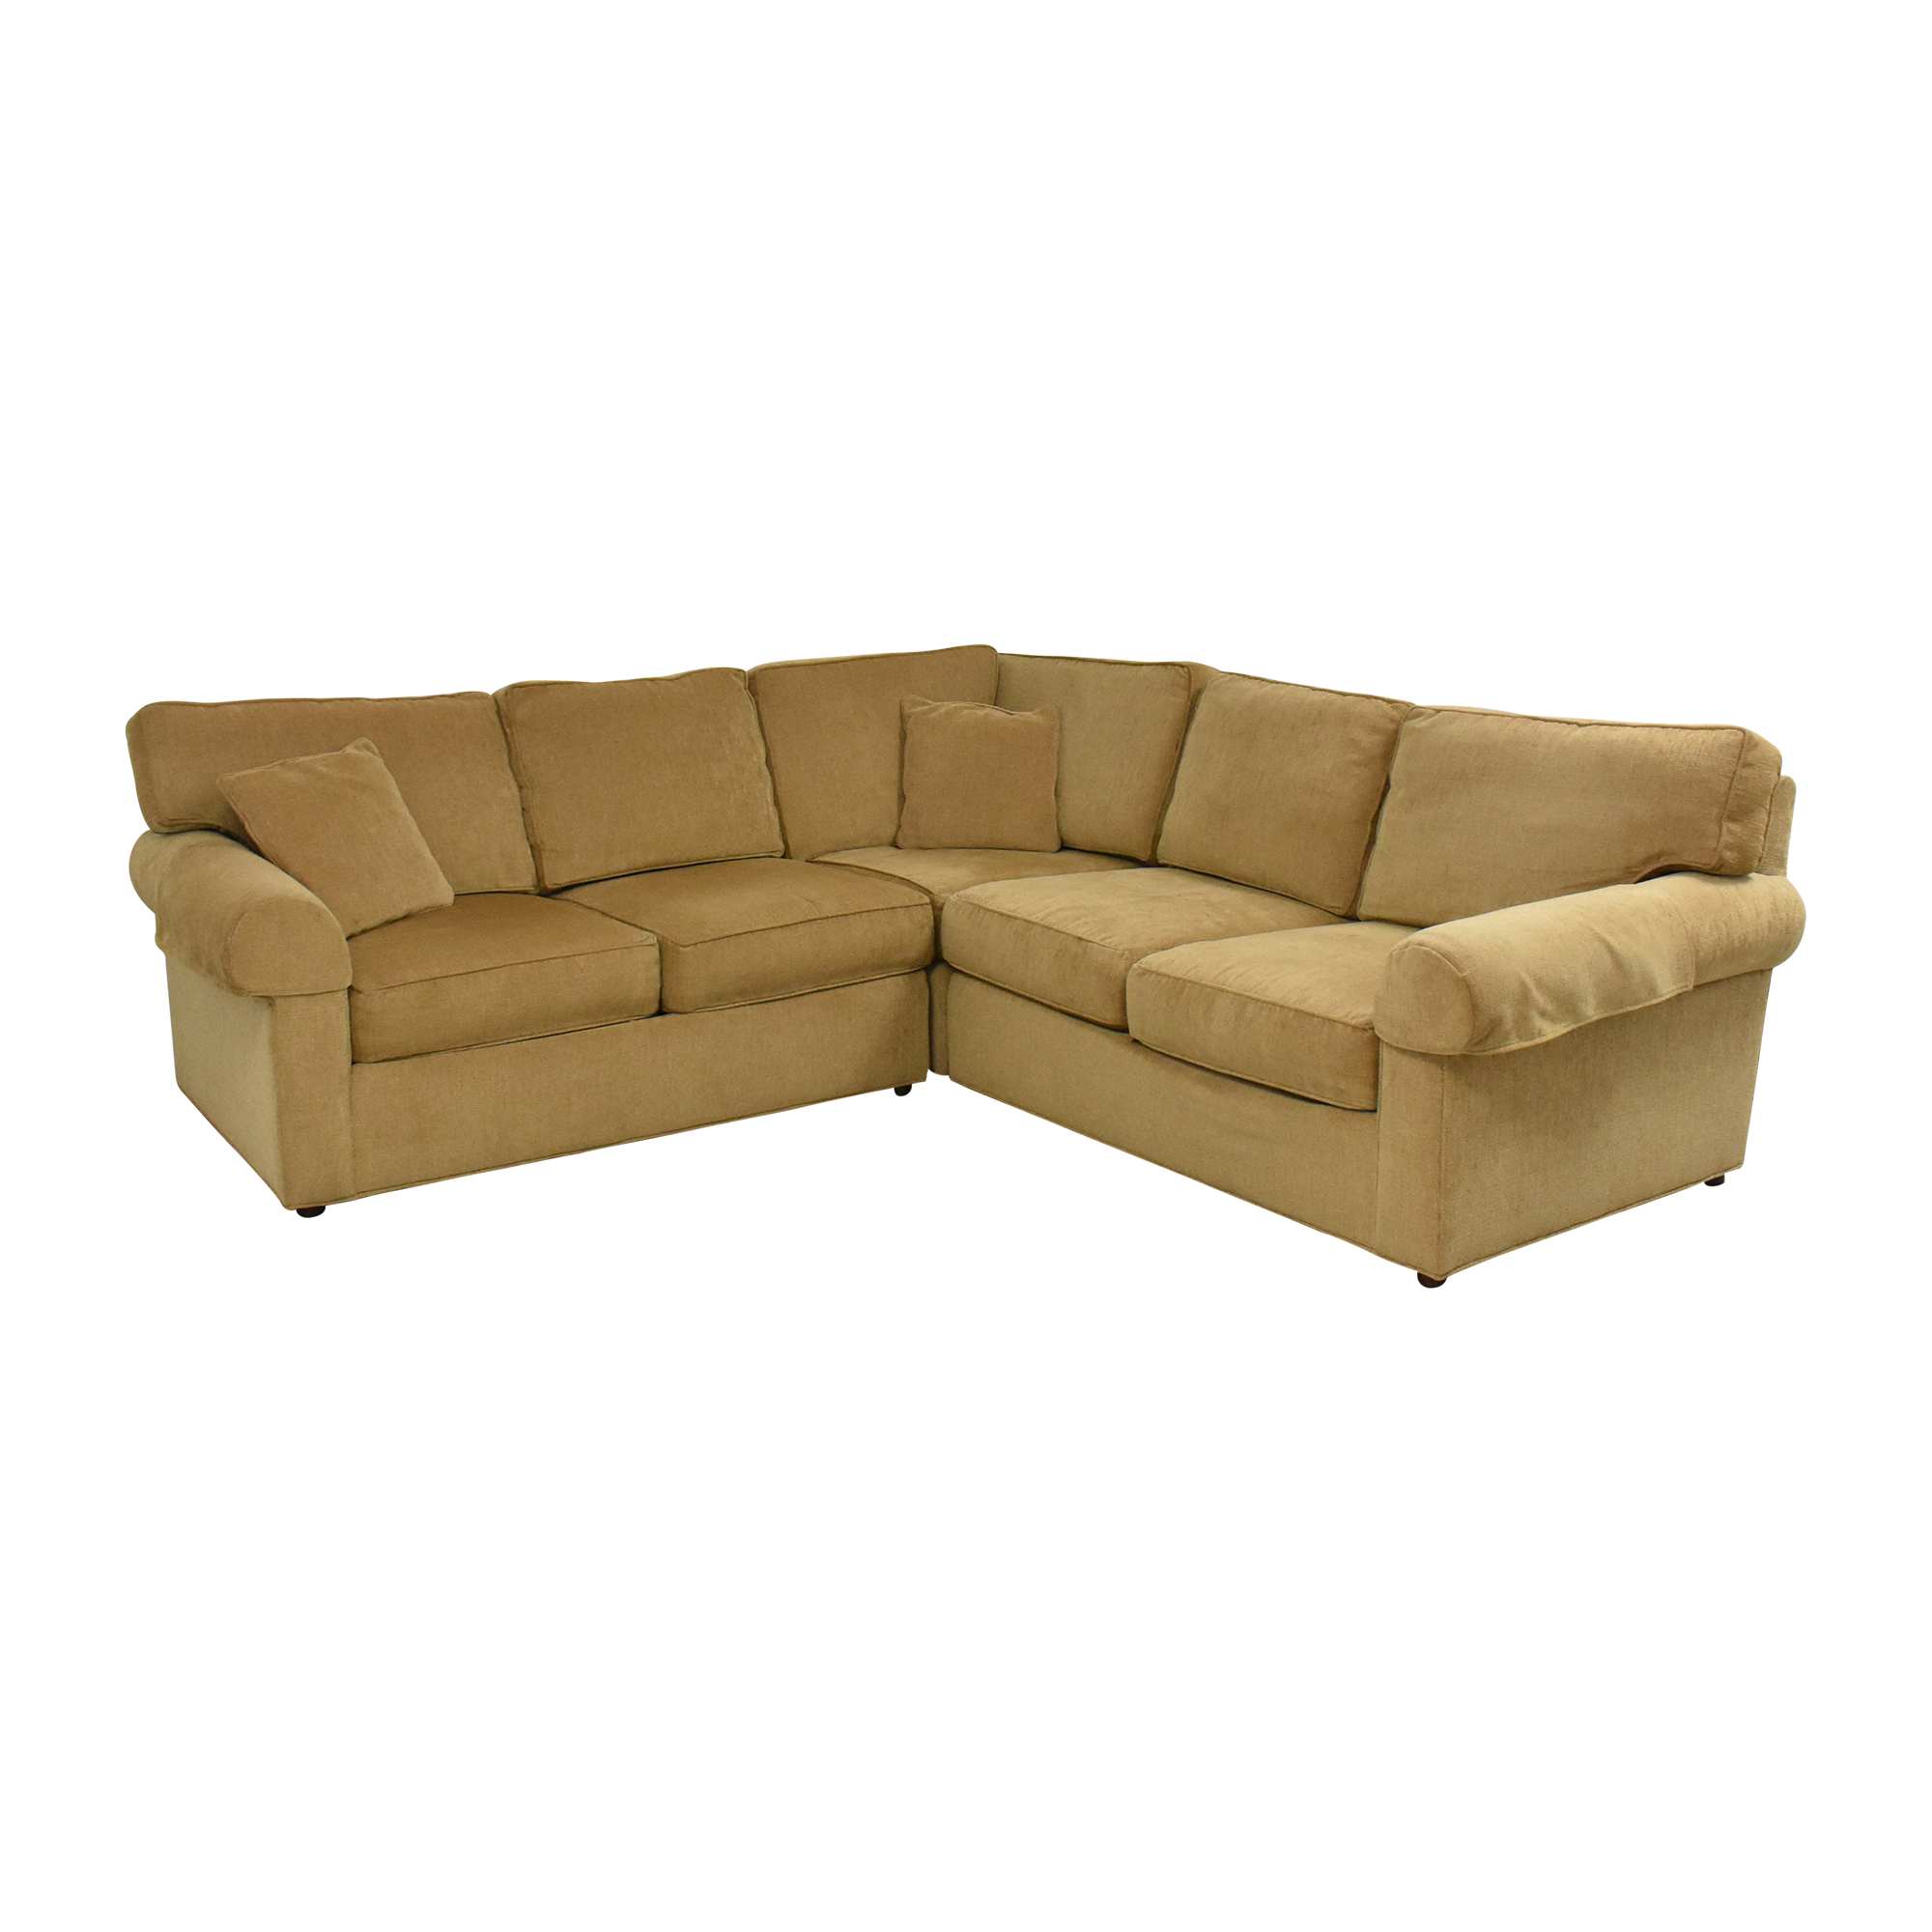 Ethan Allen Ethan Allen Retreat Roll-Arm Three-Piece Sectional Sofa nj